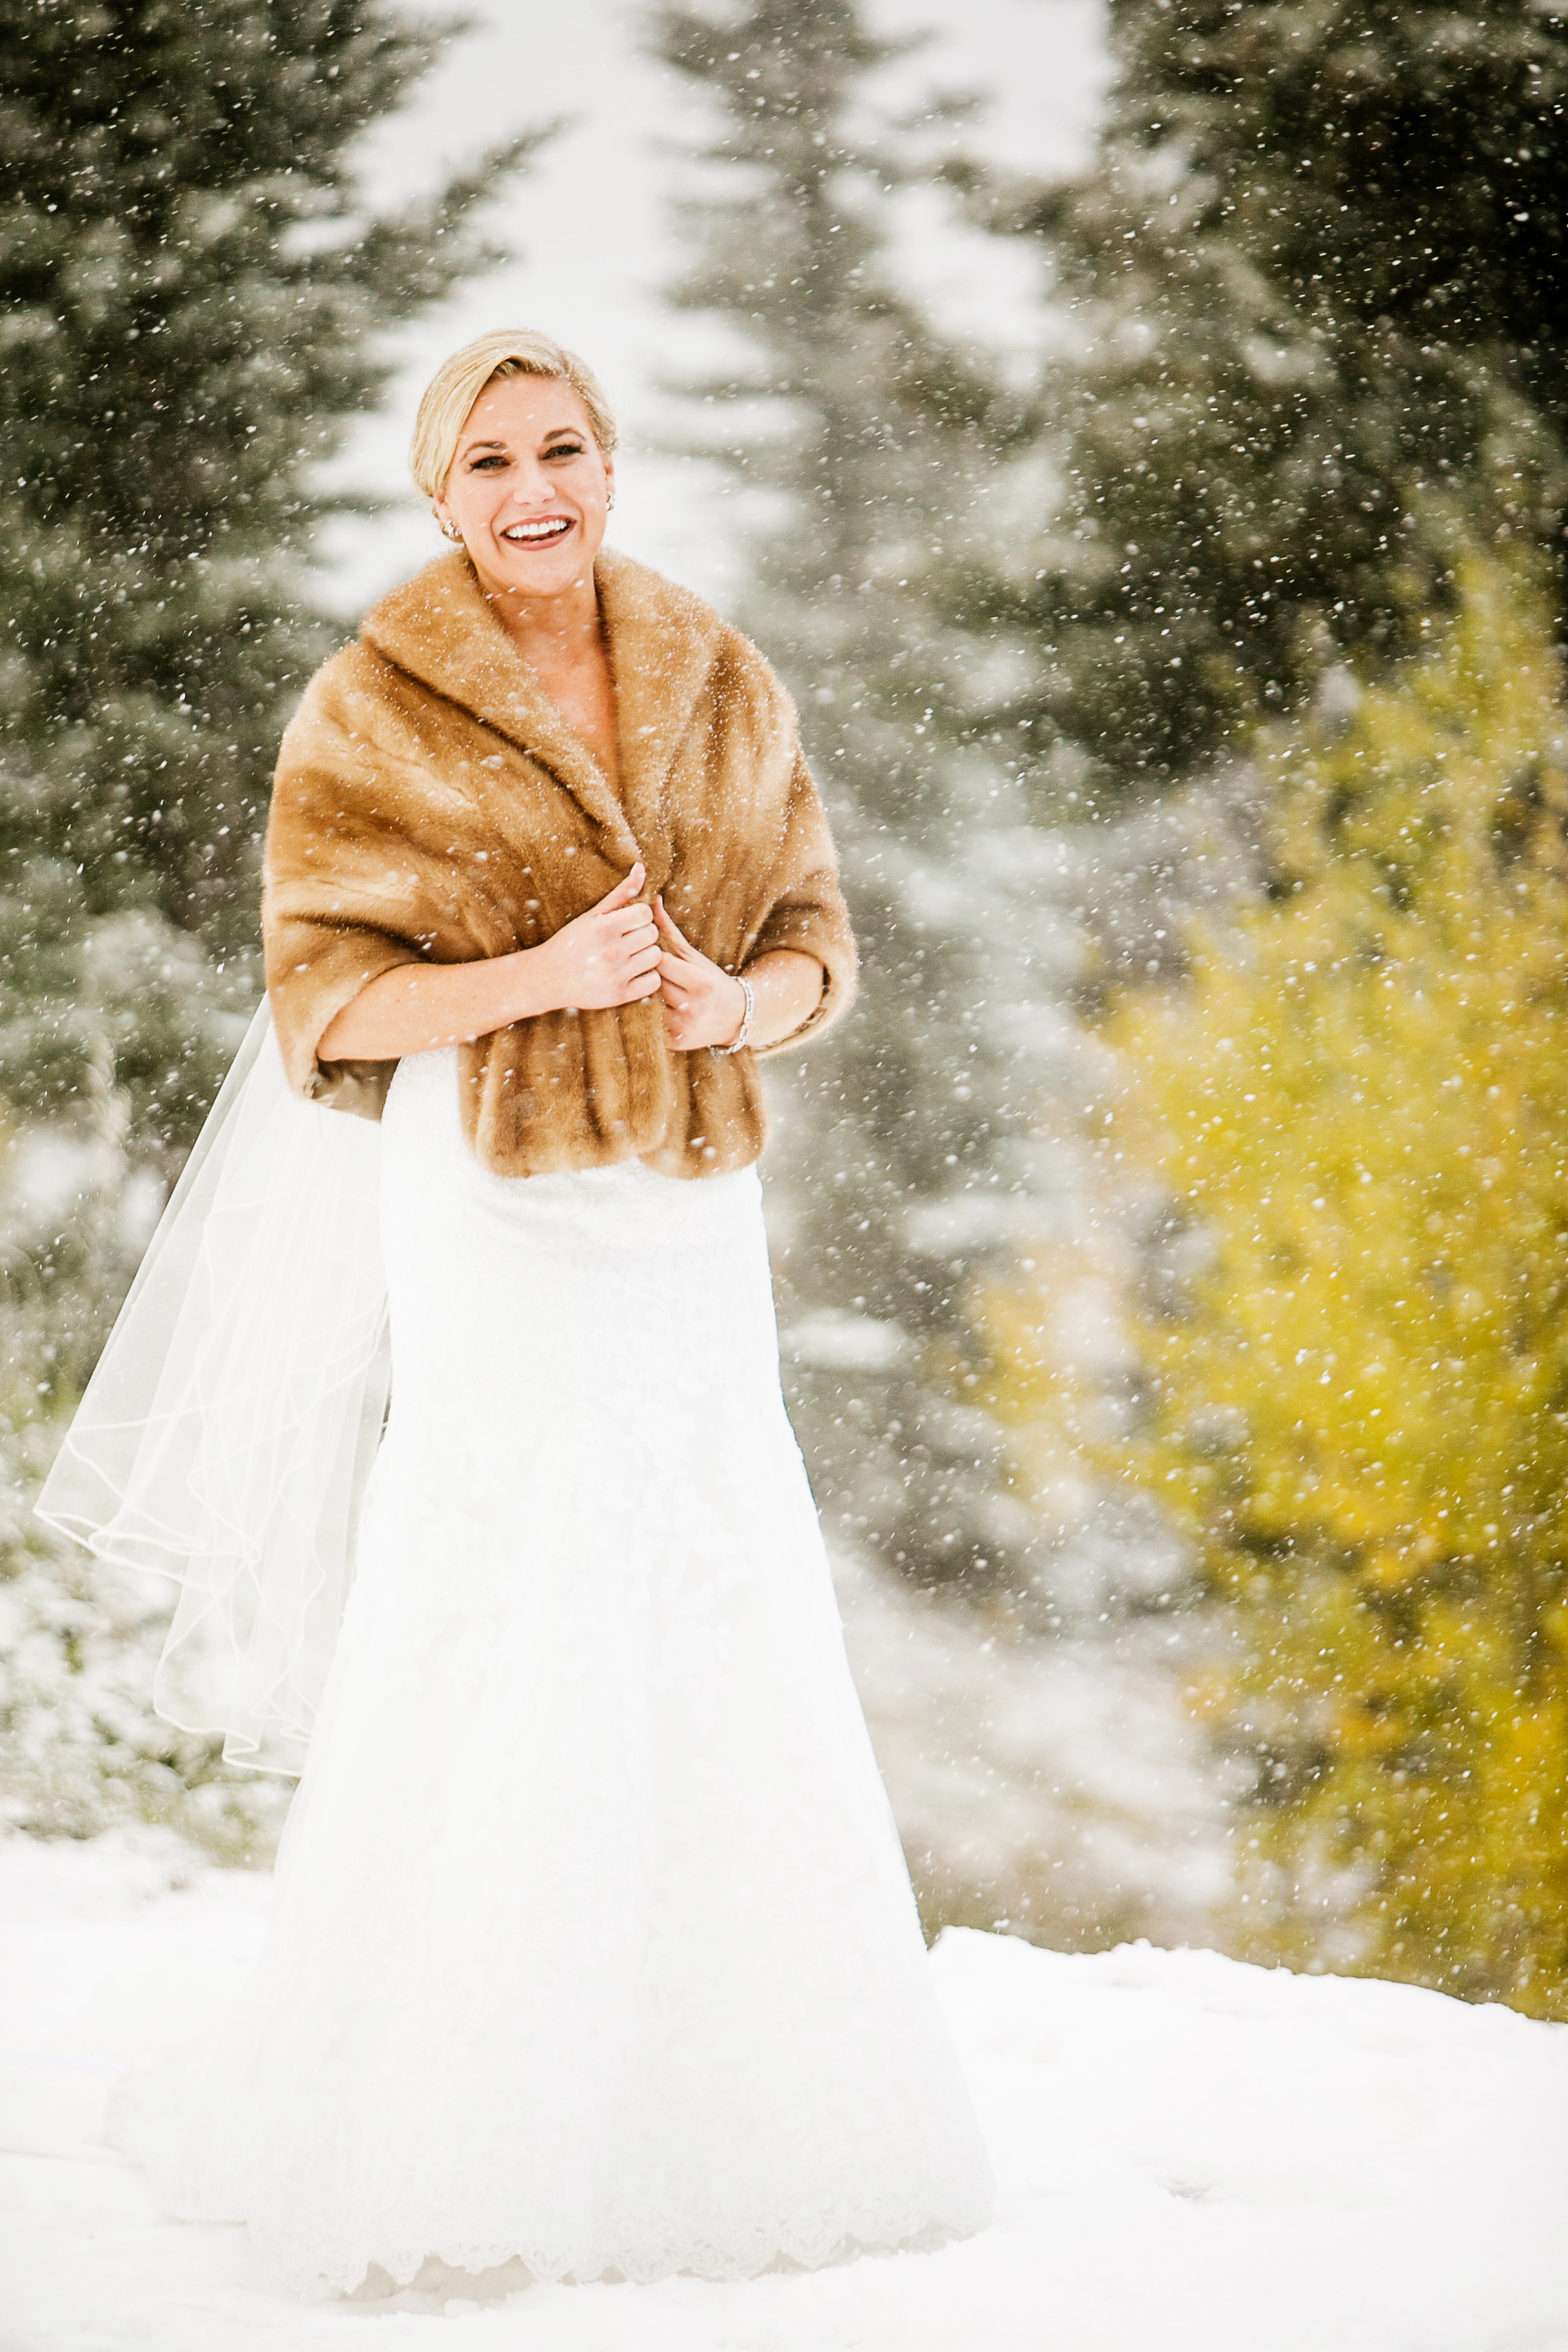 Aspen Winter Wedding Rustic Wedding Chic